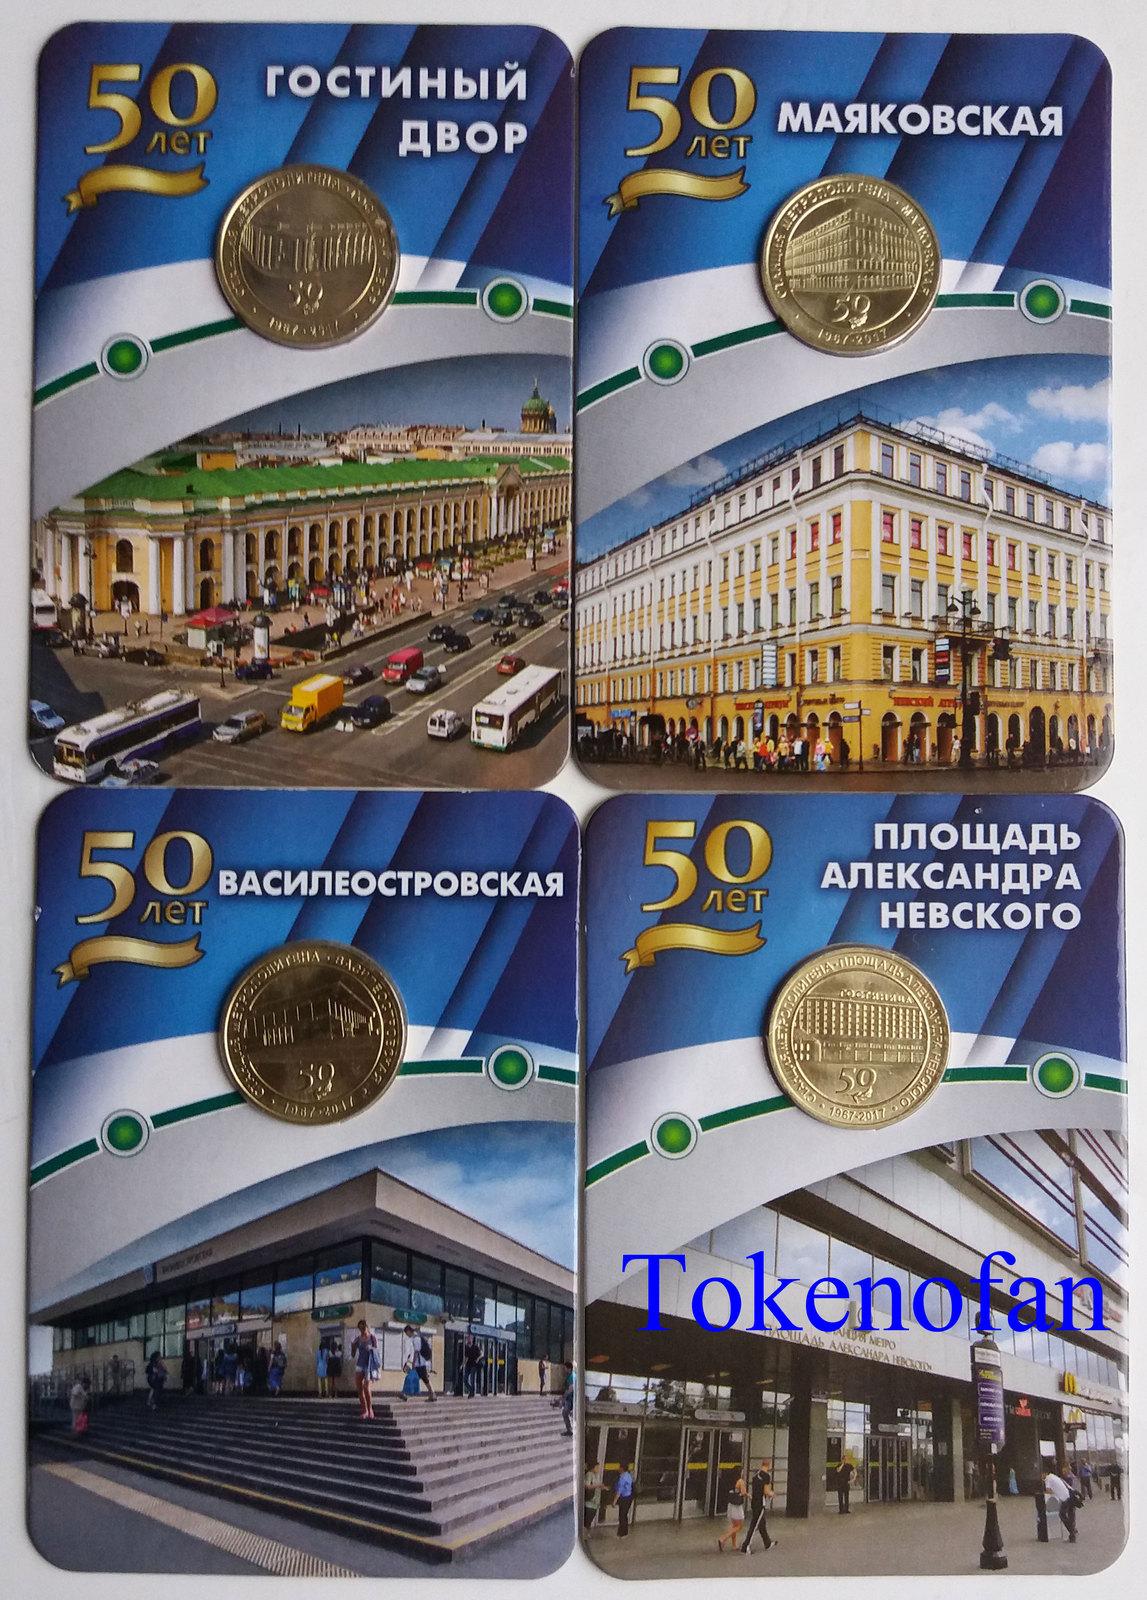 Lot 10 - four latest collectors' Saint-Petersburg subway metro tokens (Russia)